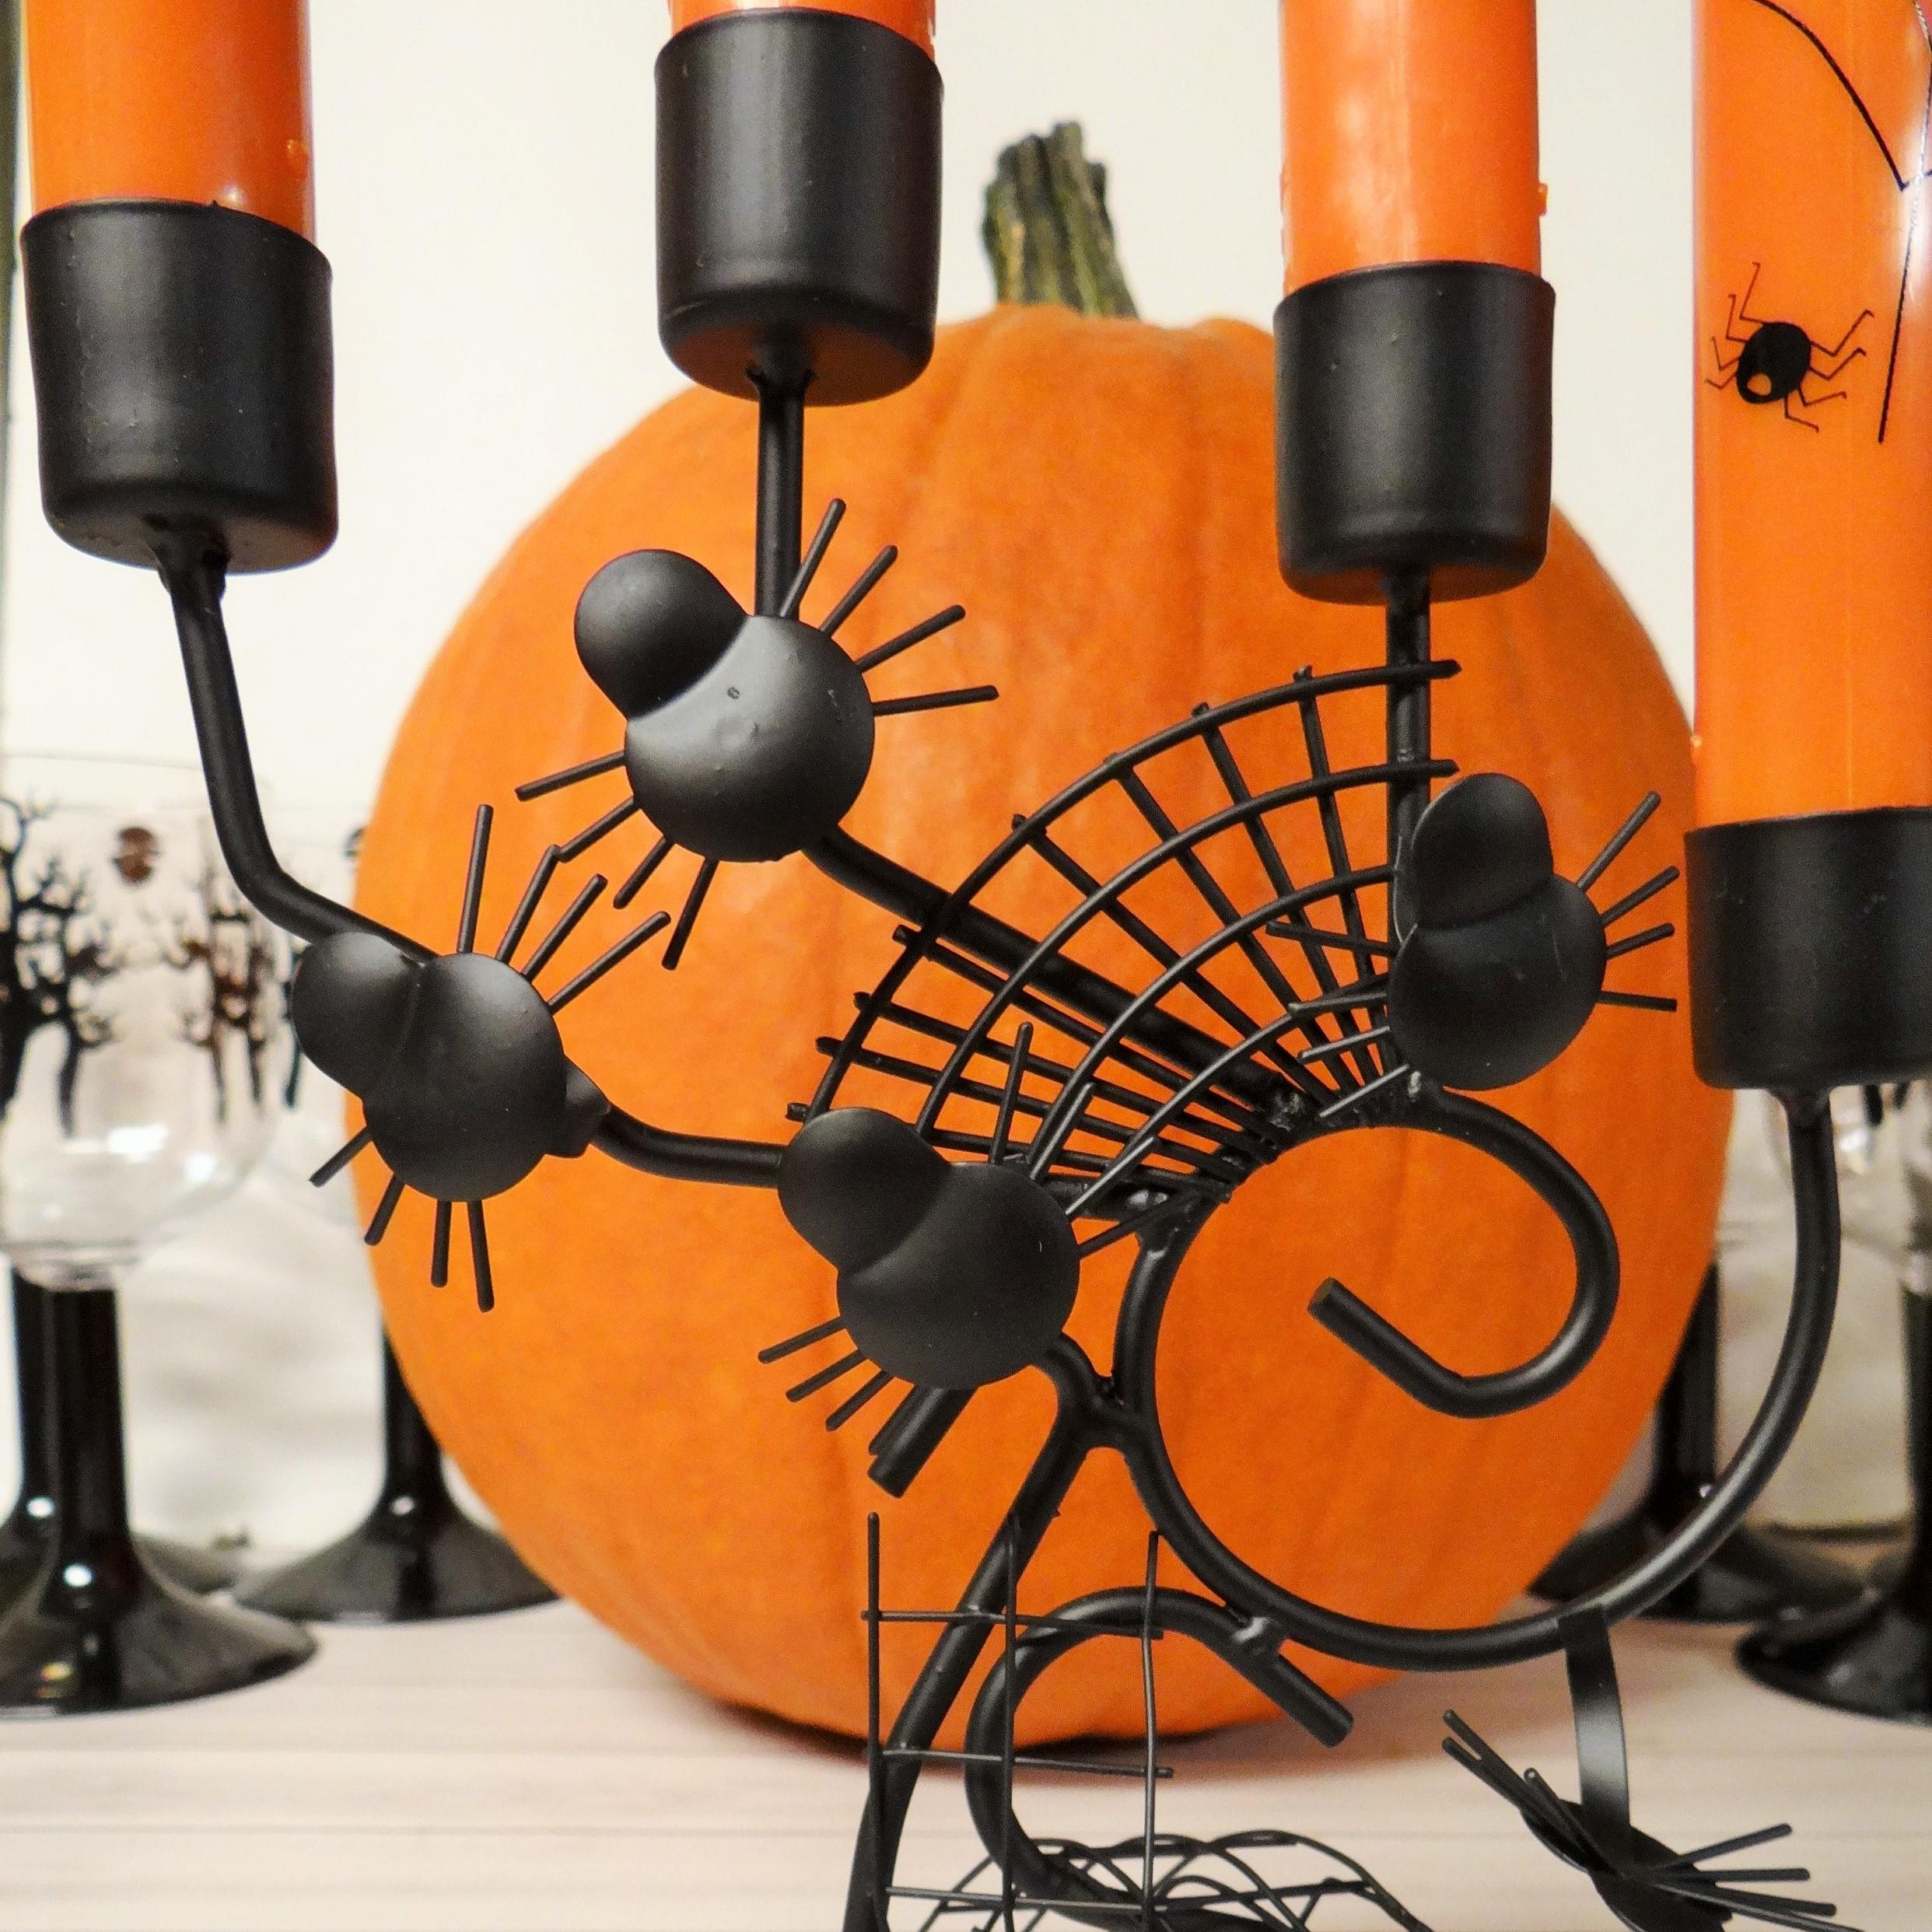 Spooky Halloween Science Lab Body Parts Jello Shots